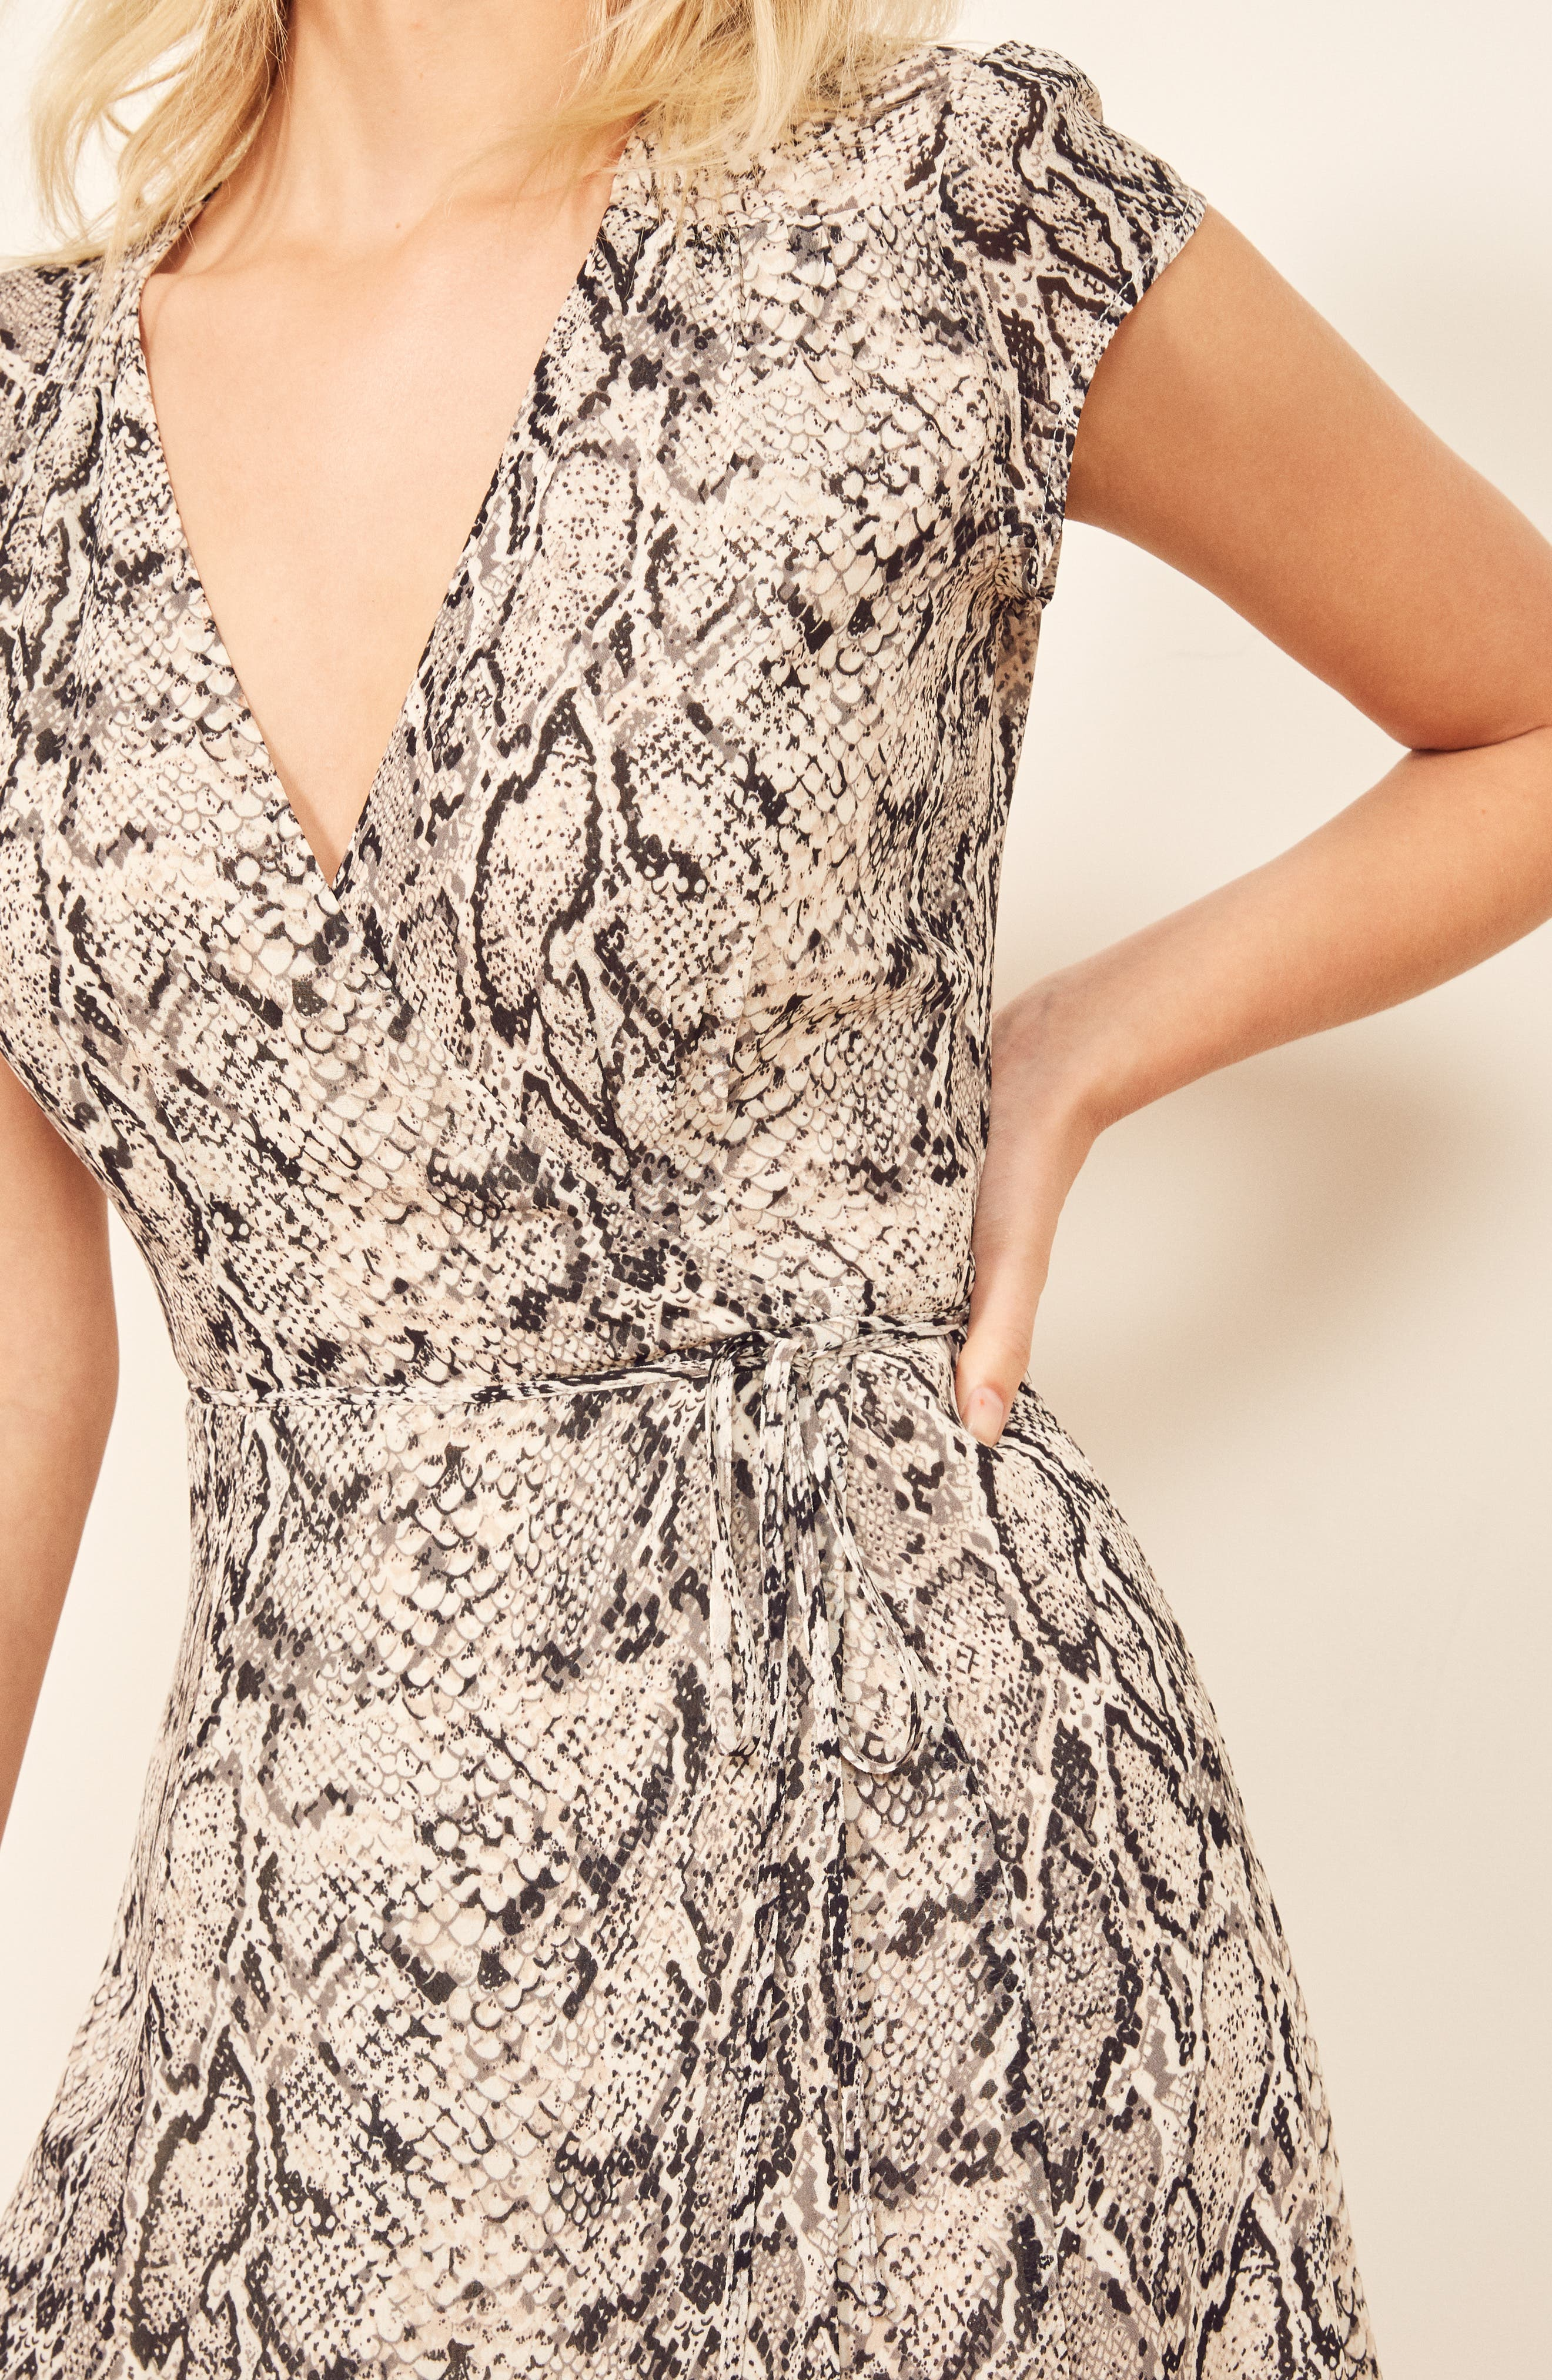 REFORMATION, Carina Midi Wrap Dress, Alternate thumbnail 6, color, RATTLESNAKE